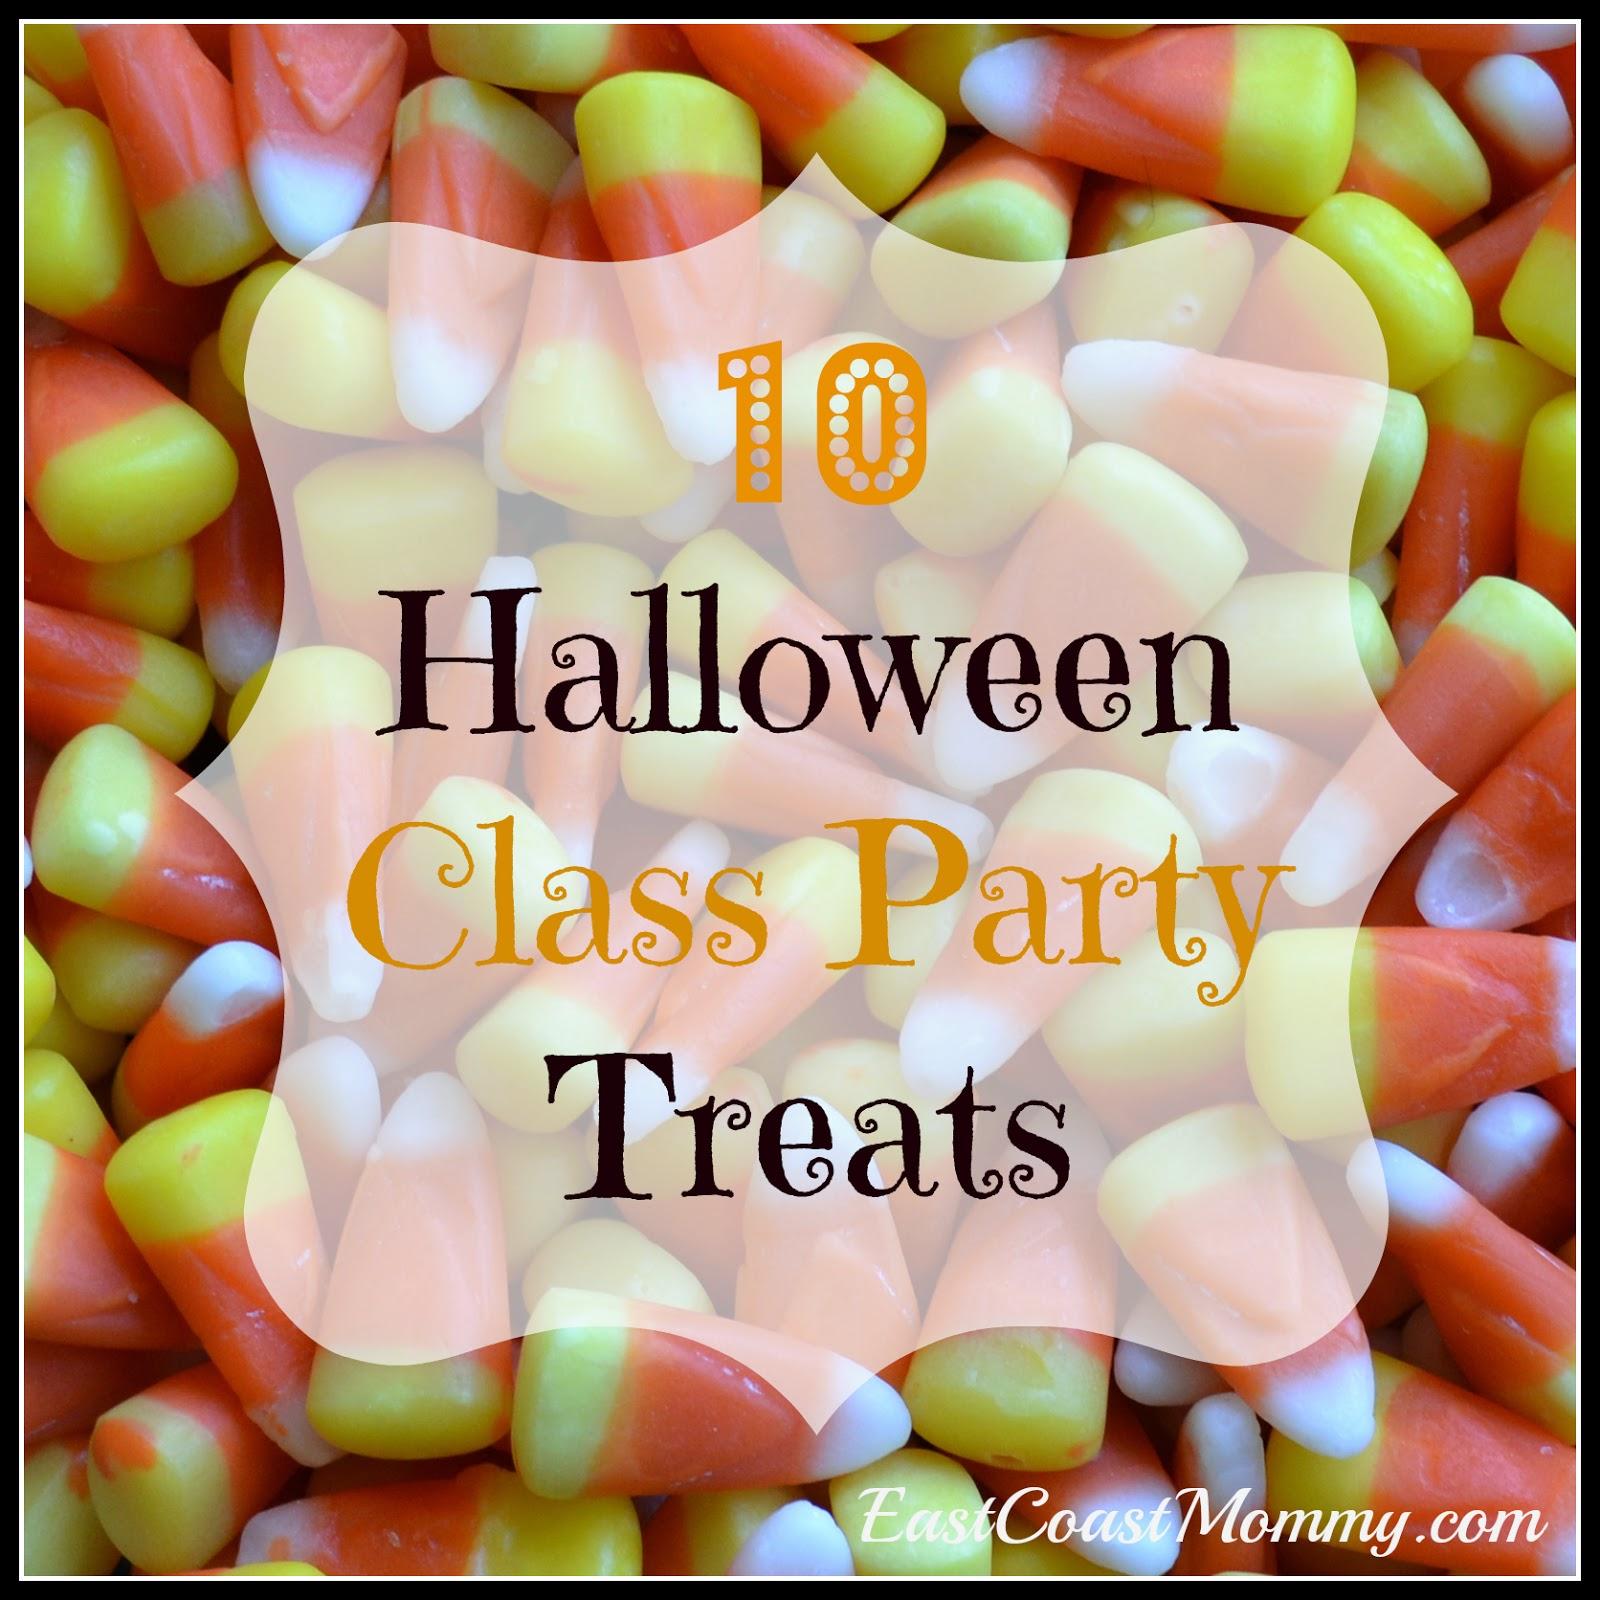 East coast mommy 10 halloween class party treats for Easy fun halloween treats for school